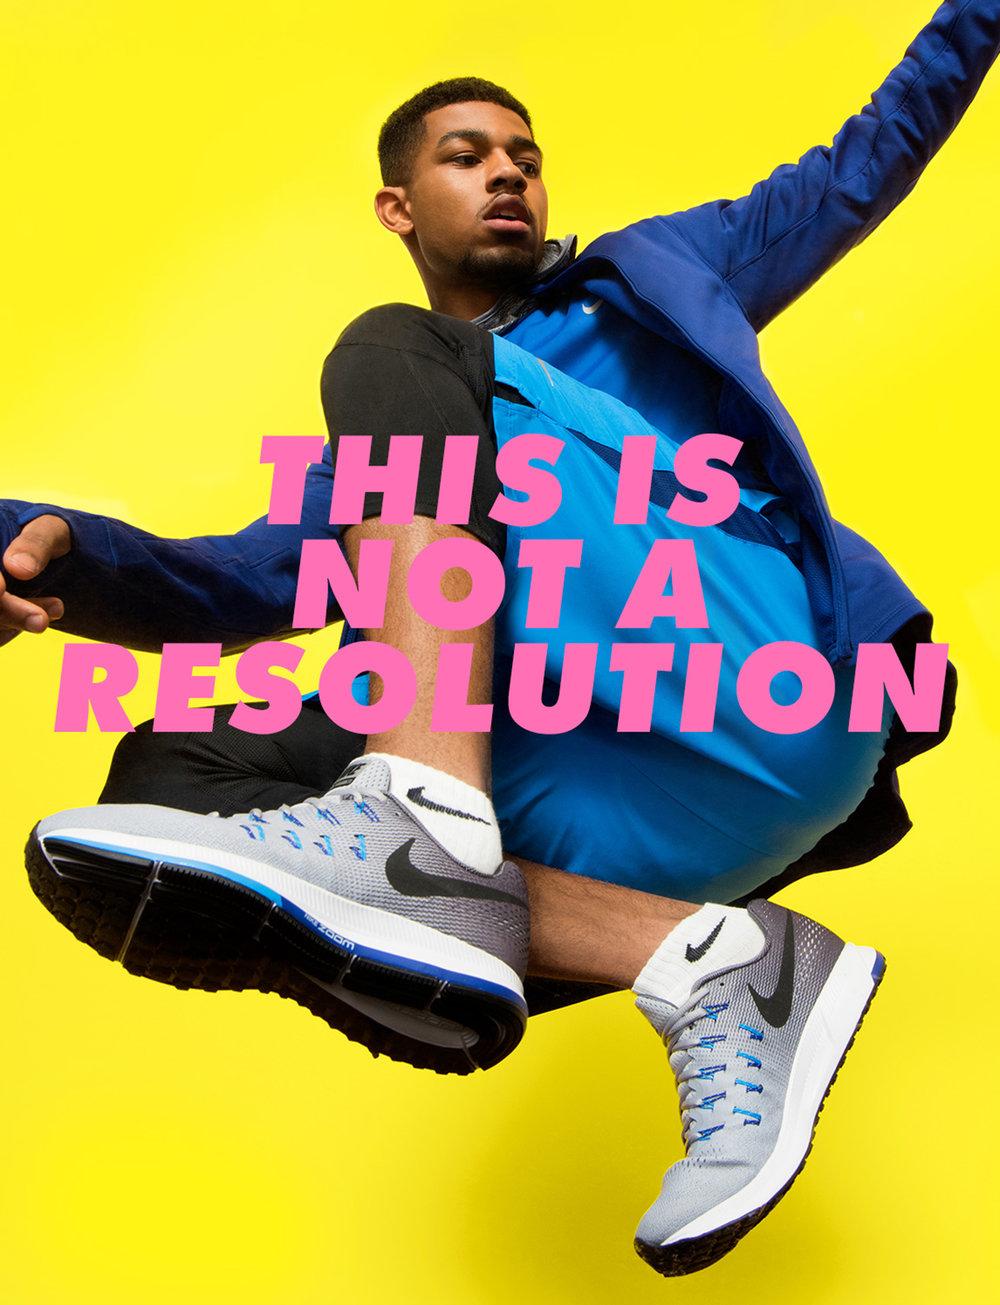 gl-sportswear-app-cta-mw copy.jpg